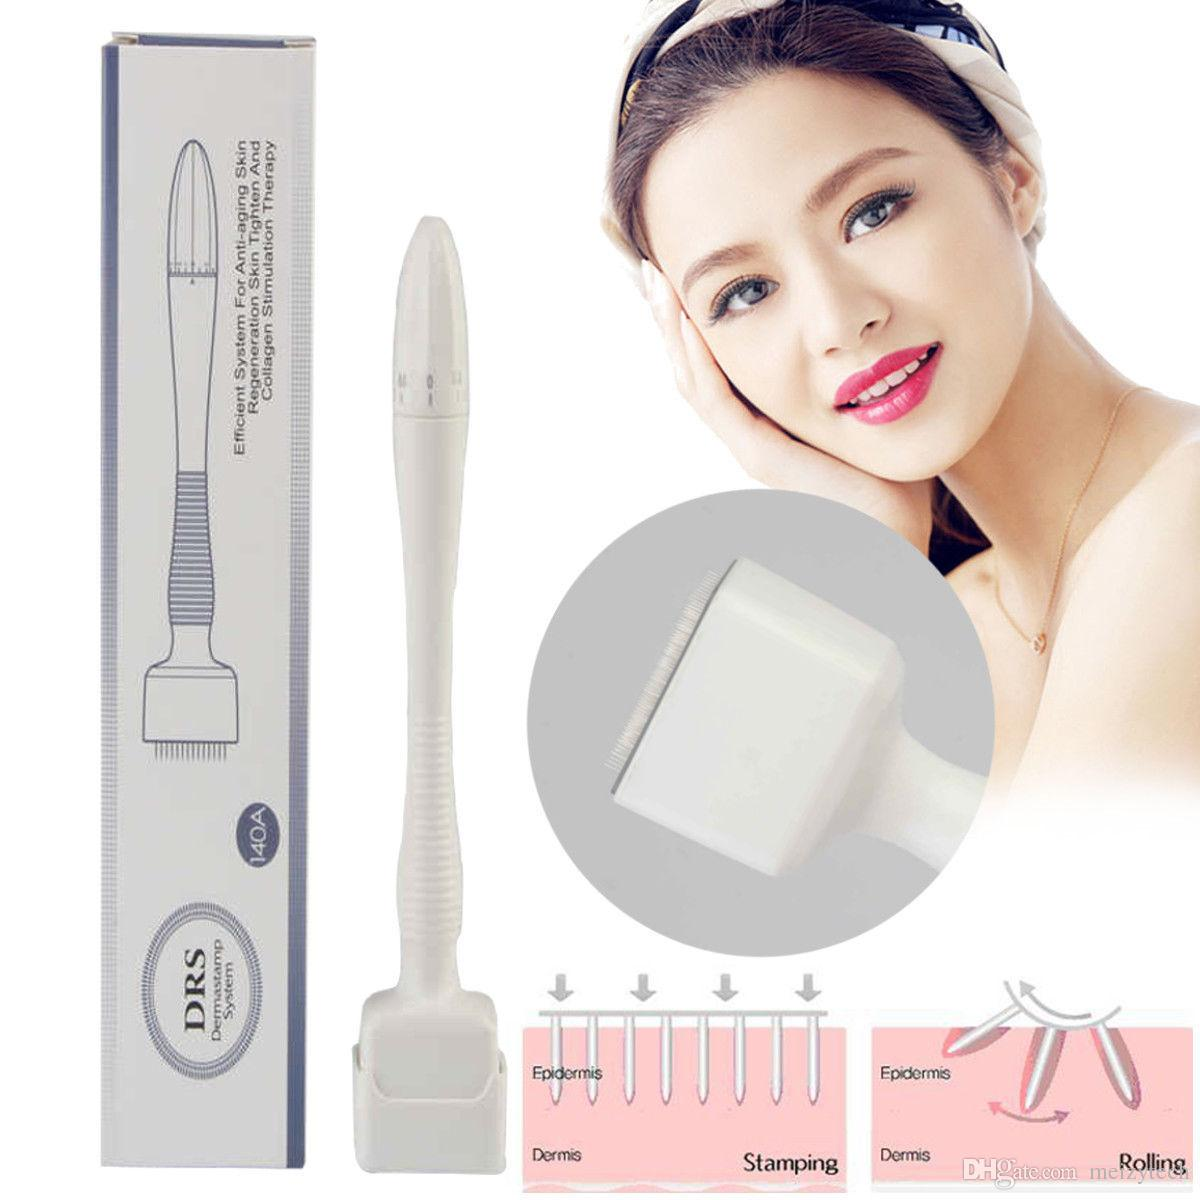 USA Micro needle roller Titanium beauty Derma Wrinkles Scars Acne 192 pin 2.5mm Kanebo - Sensai Cellular Performance Lotion I - Light (New Packaging) -125ml/4.2oz